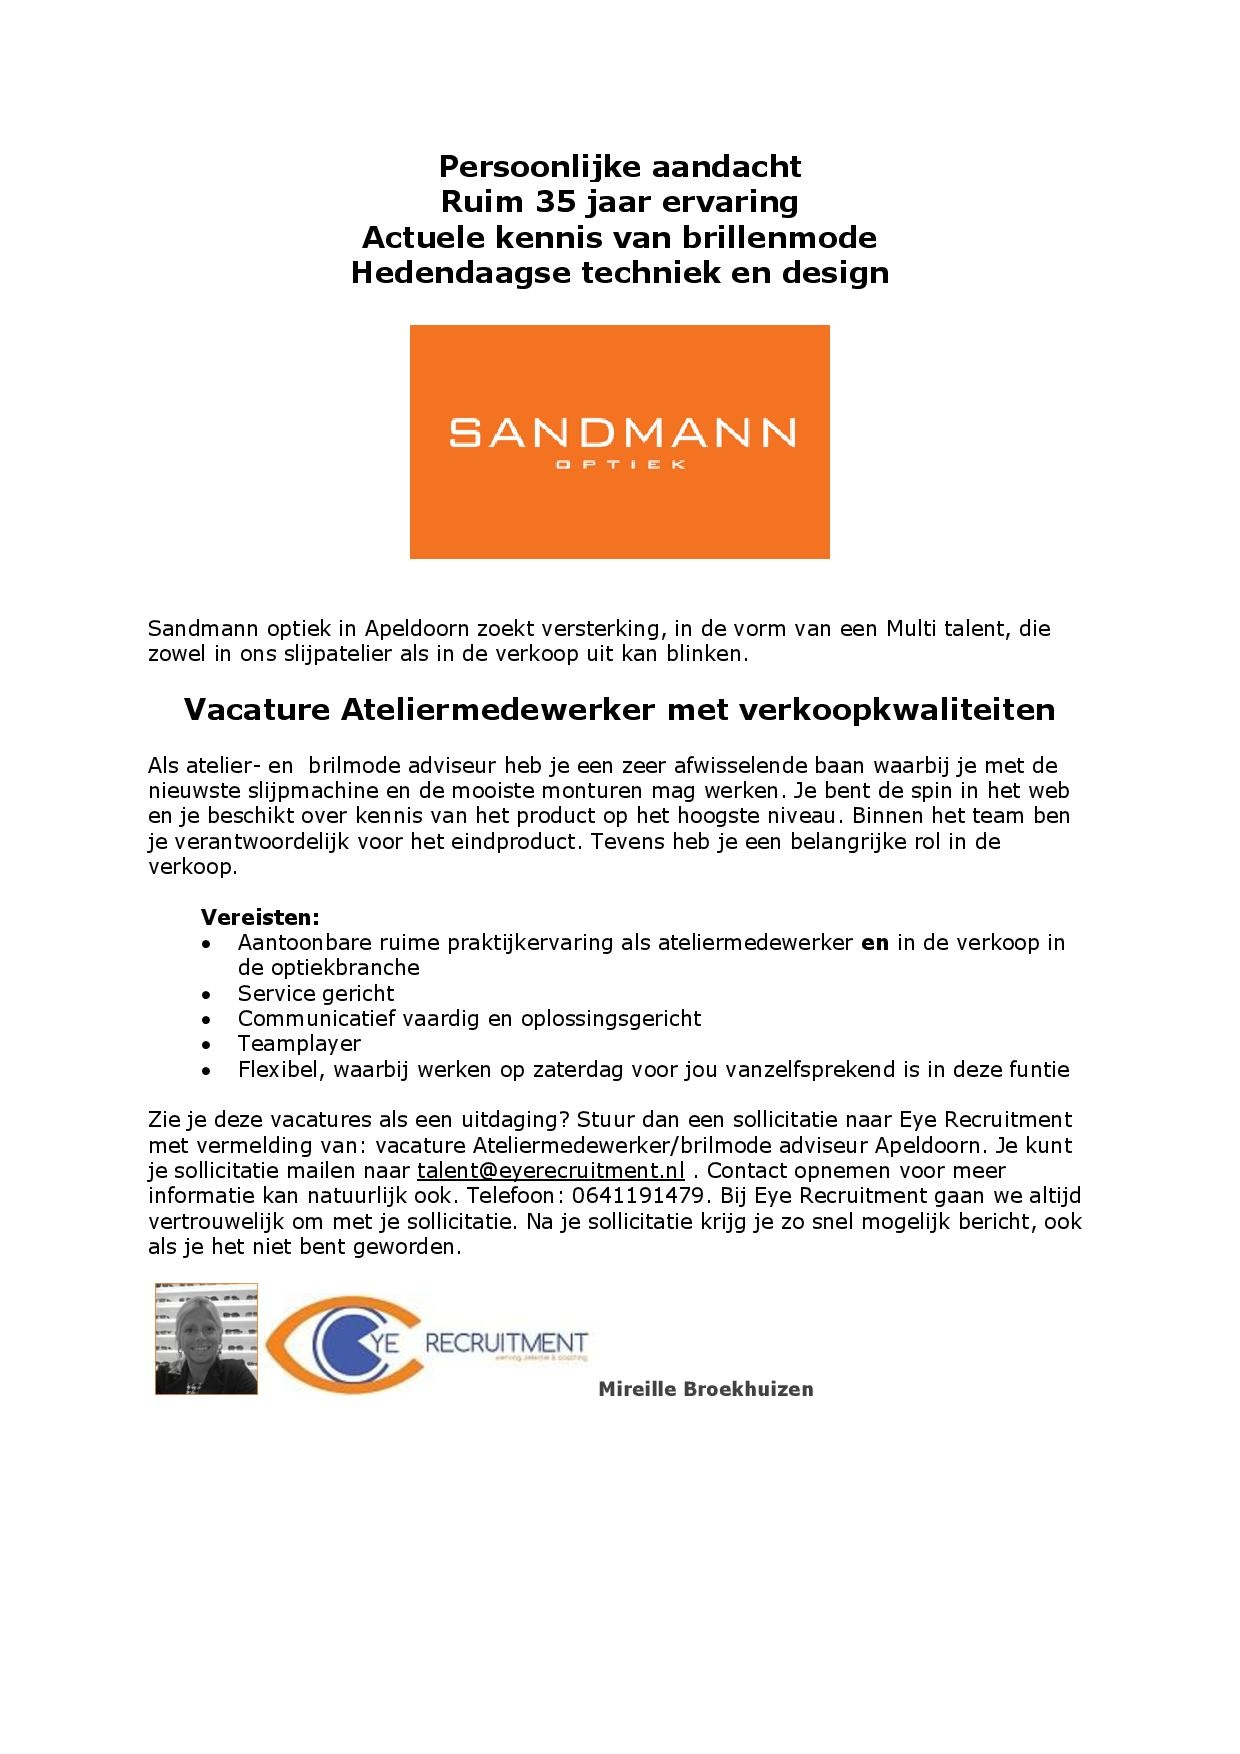 Advertentie Sandmann Ateliermedewerker-page-001